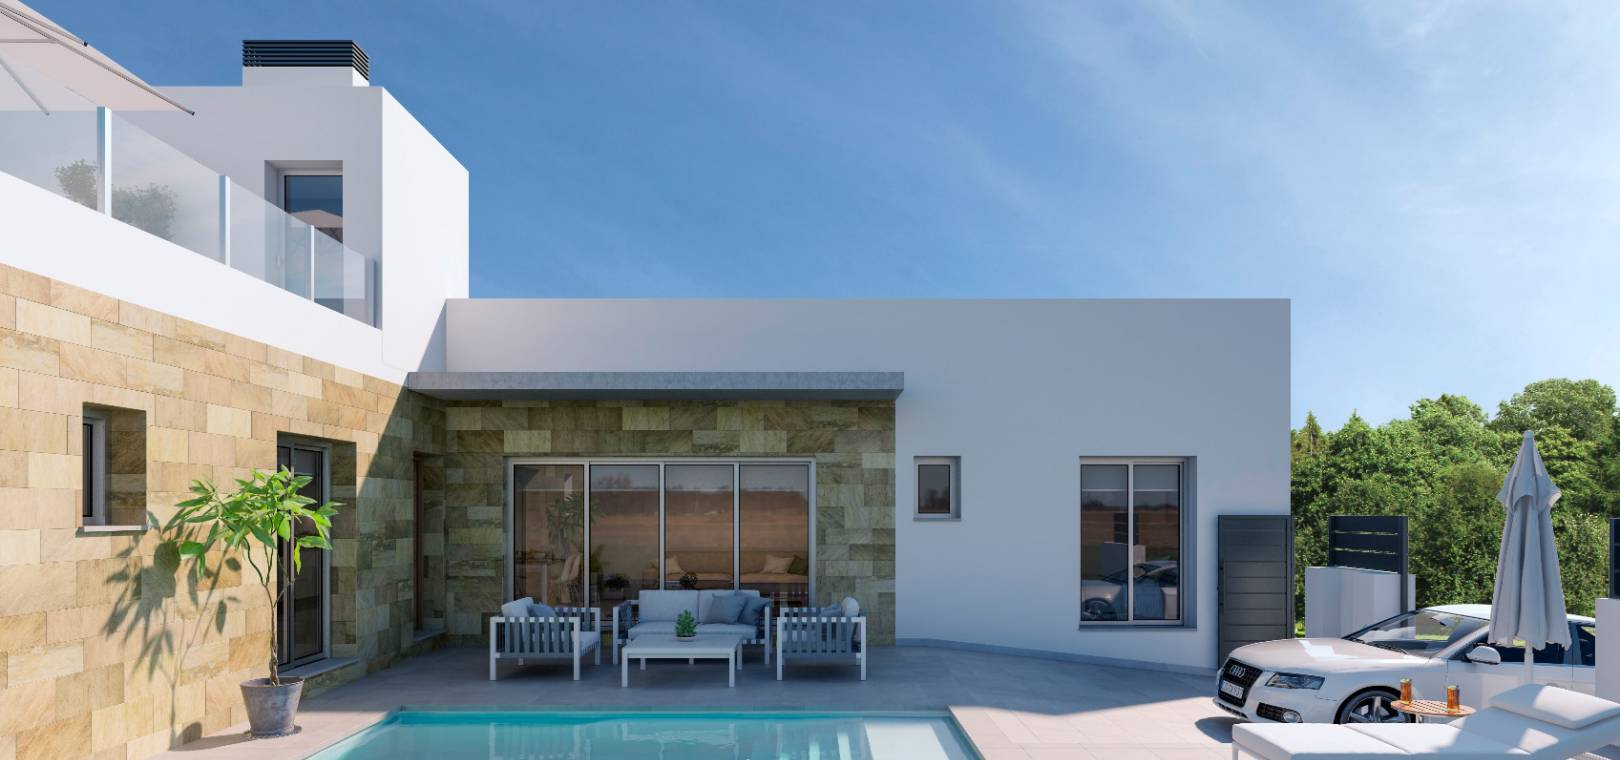 Nouvelle construction - Villa - Daya Vieja